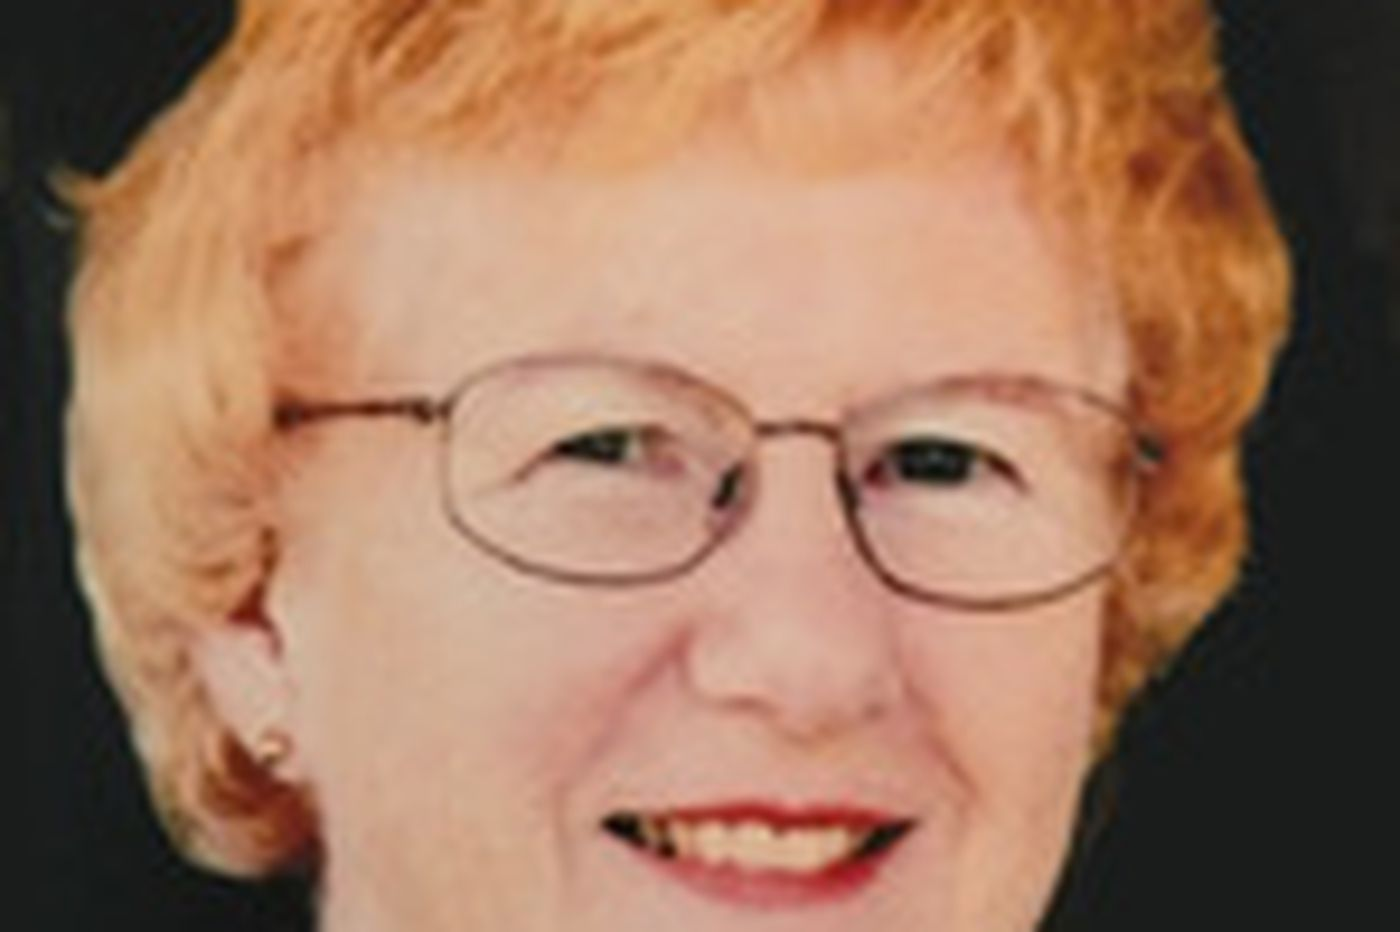 Carol P. Germain, 86, educator and innovative researcher at Penn's Nursing School